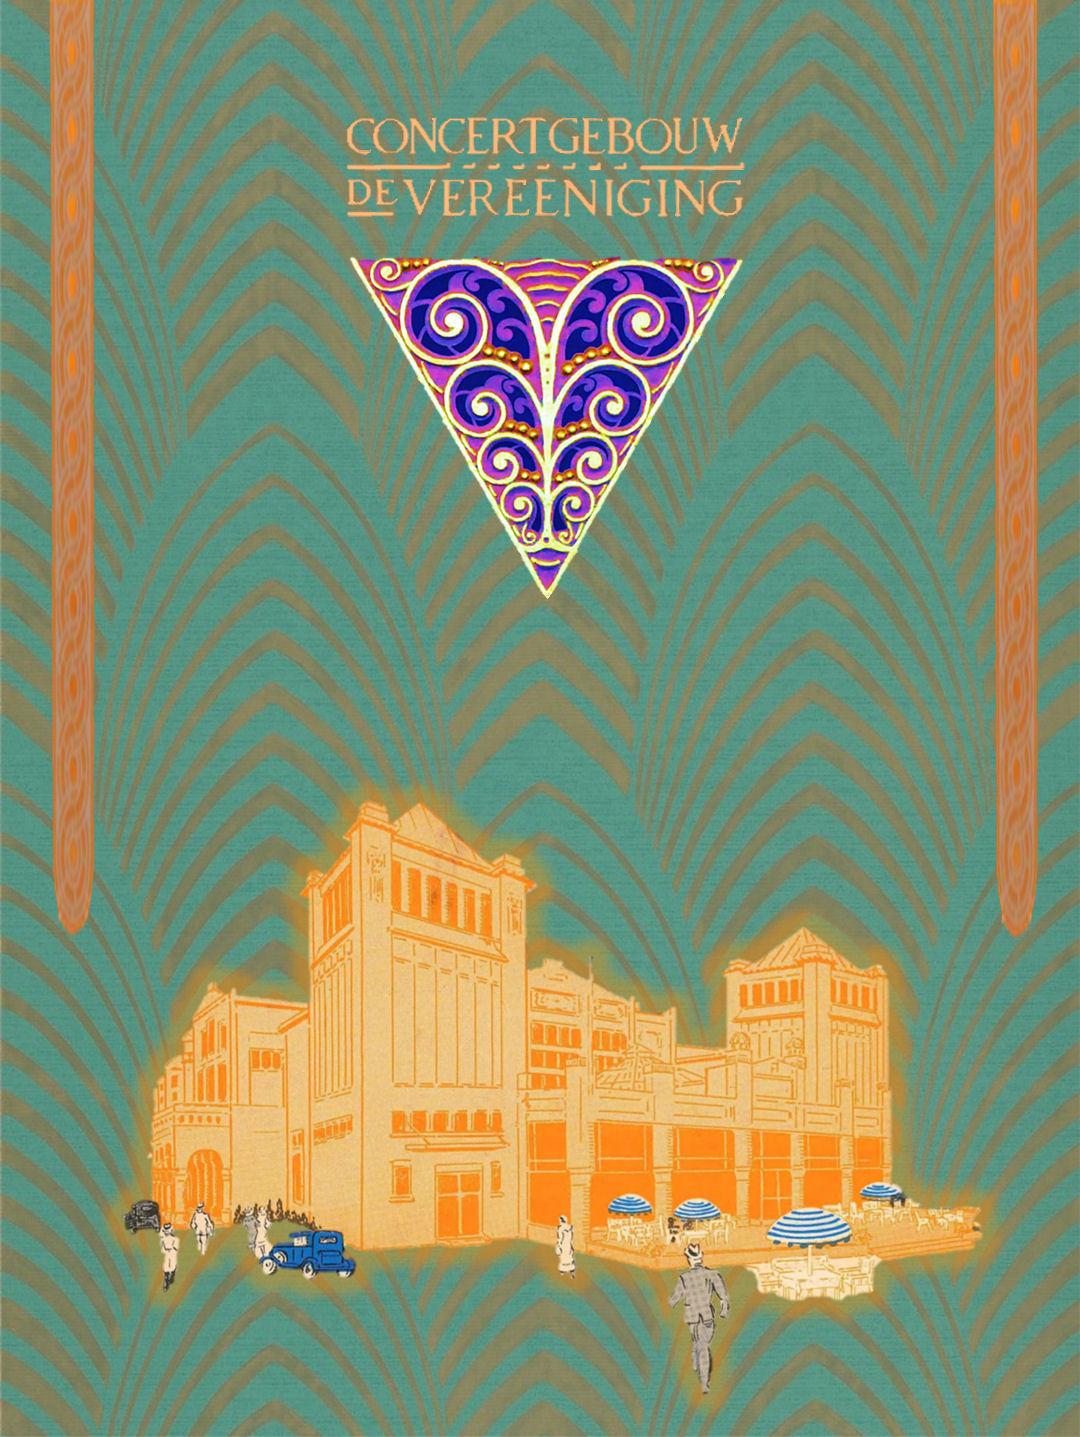 File Concertgebouw De Vereeniging Nijmegen Art Deco Art Nouveau 2018